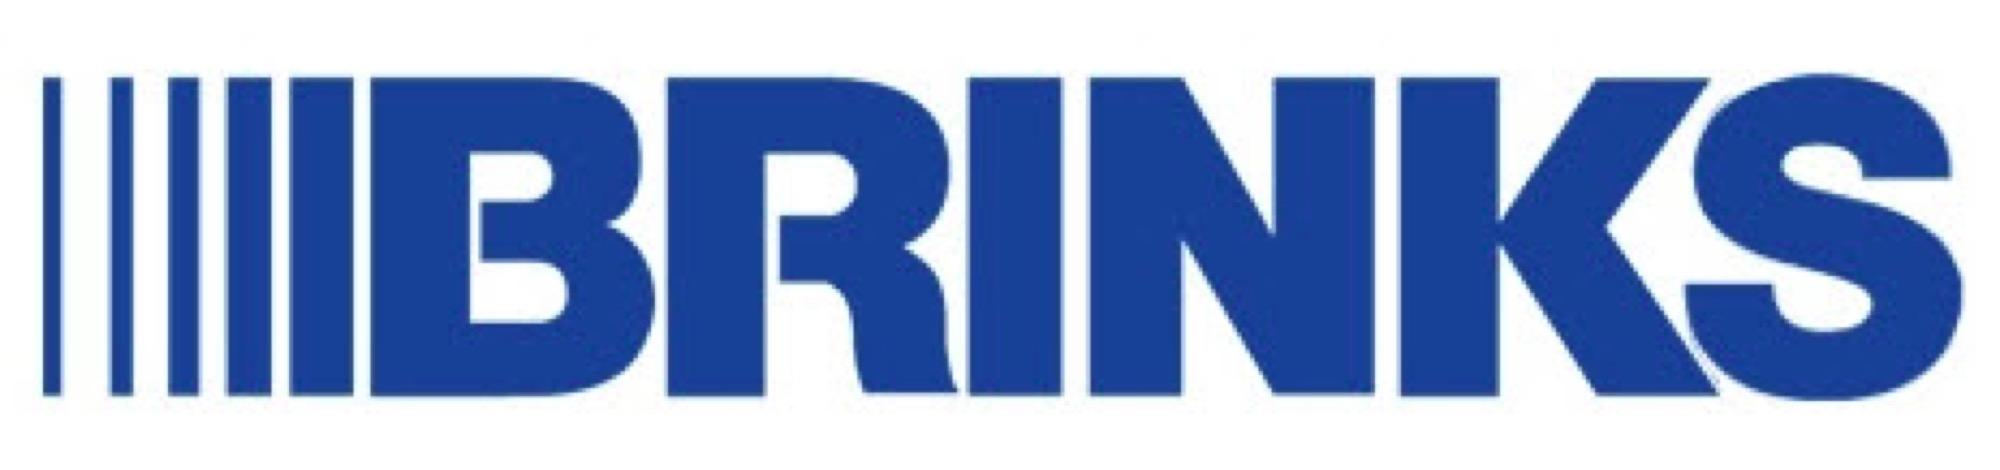 logo client cegi brinks